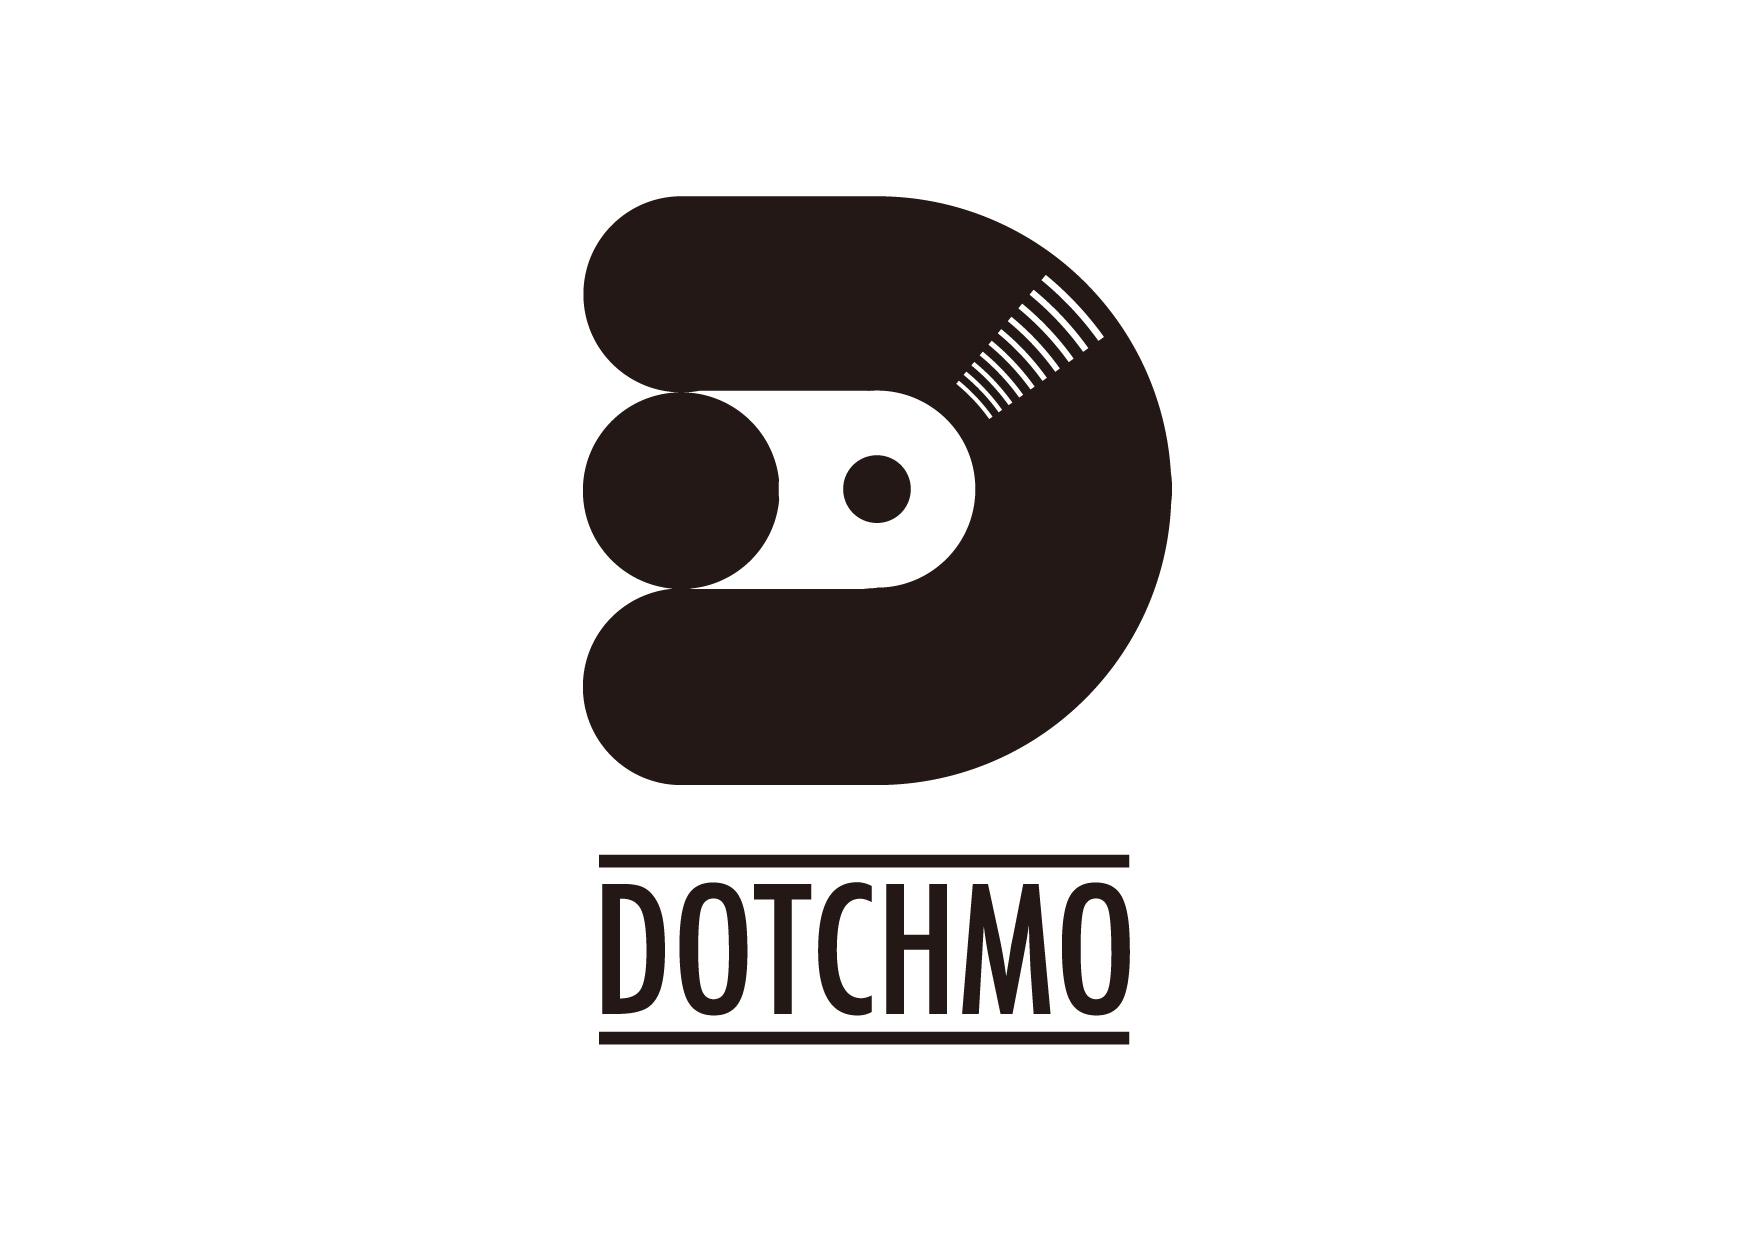 Dotchmo logo.jpg